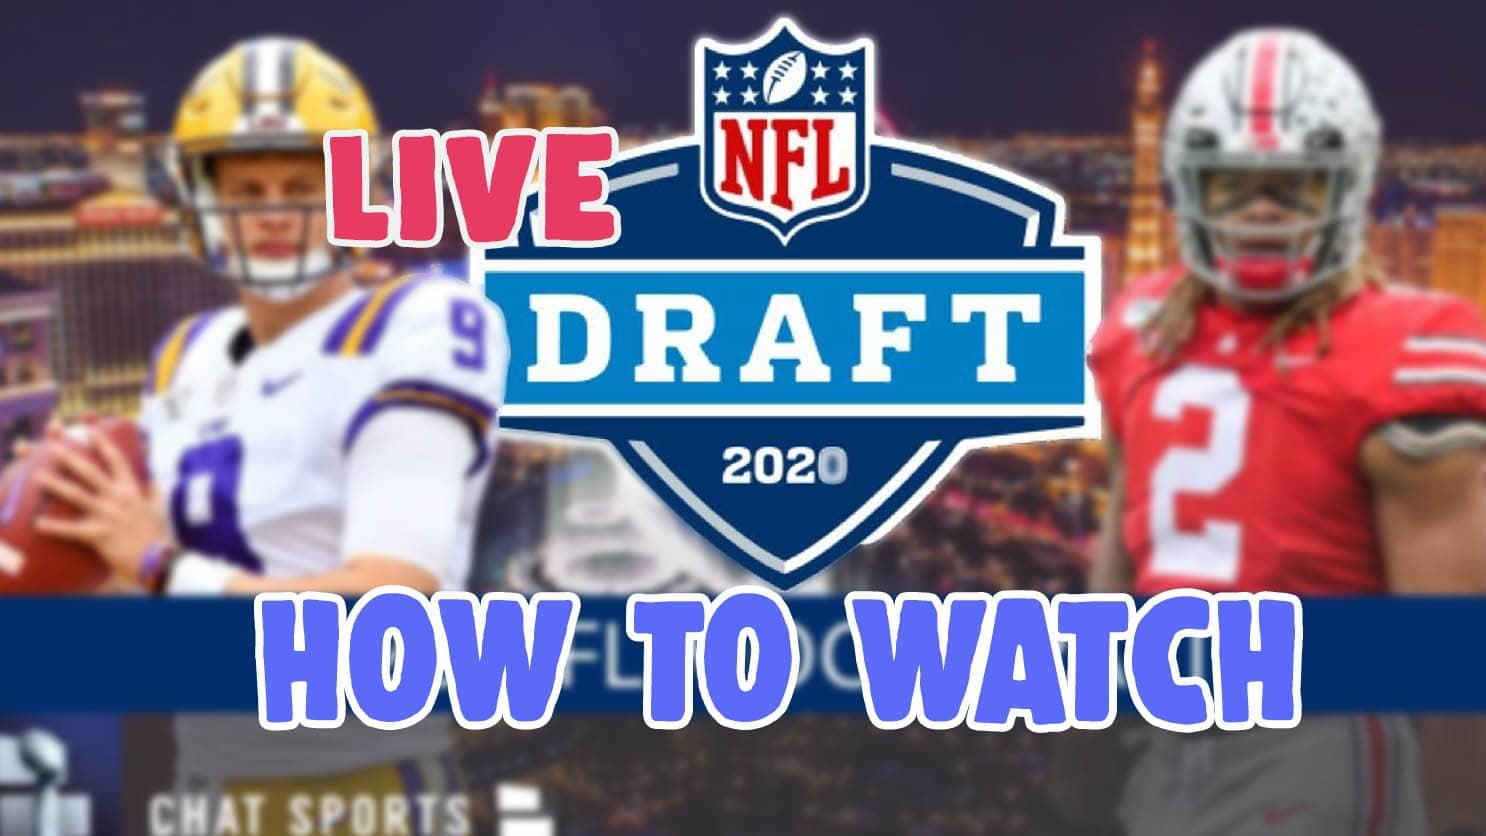 watch nfl draft 2020 live stream free